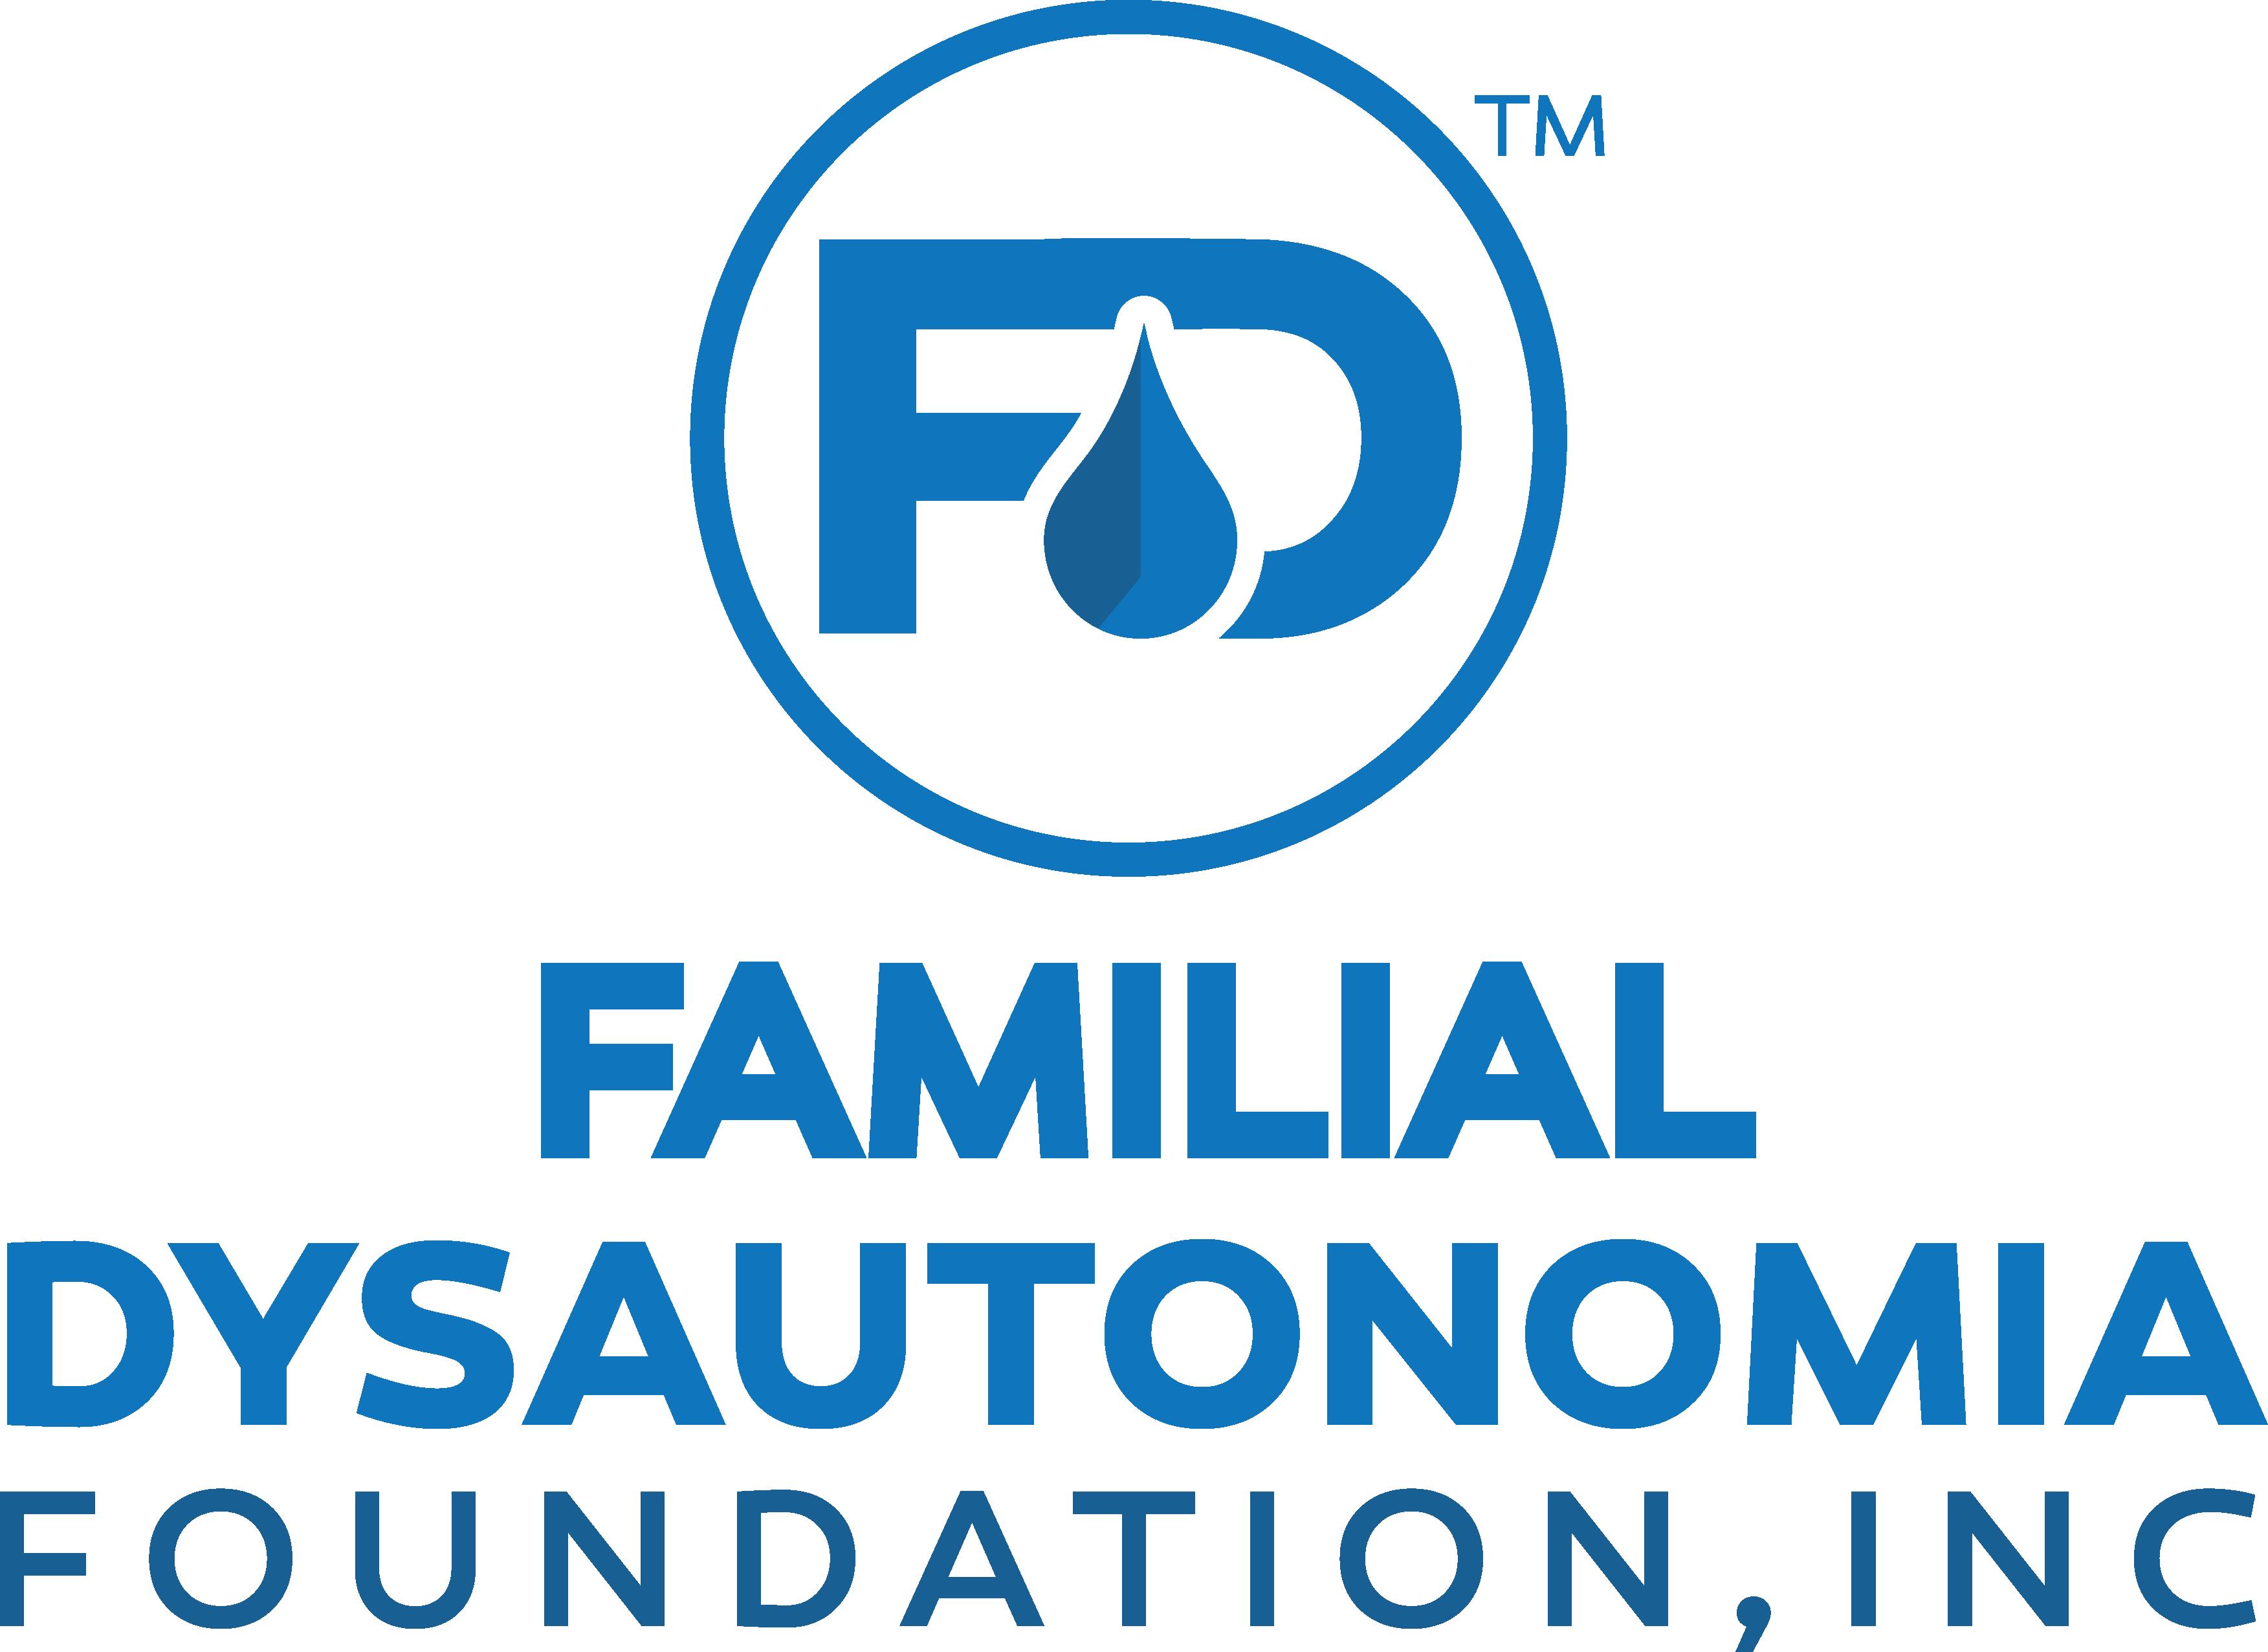 Familial Dysautonomia Foundation